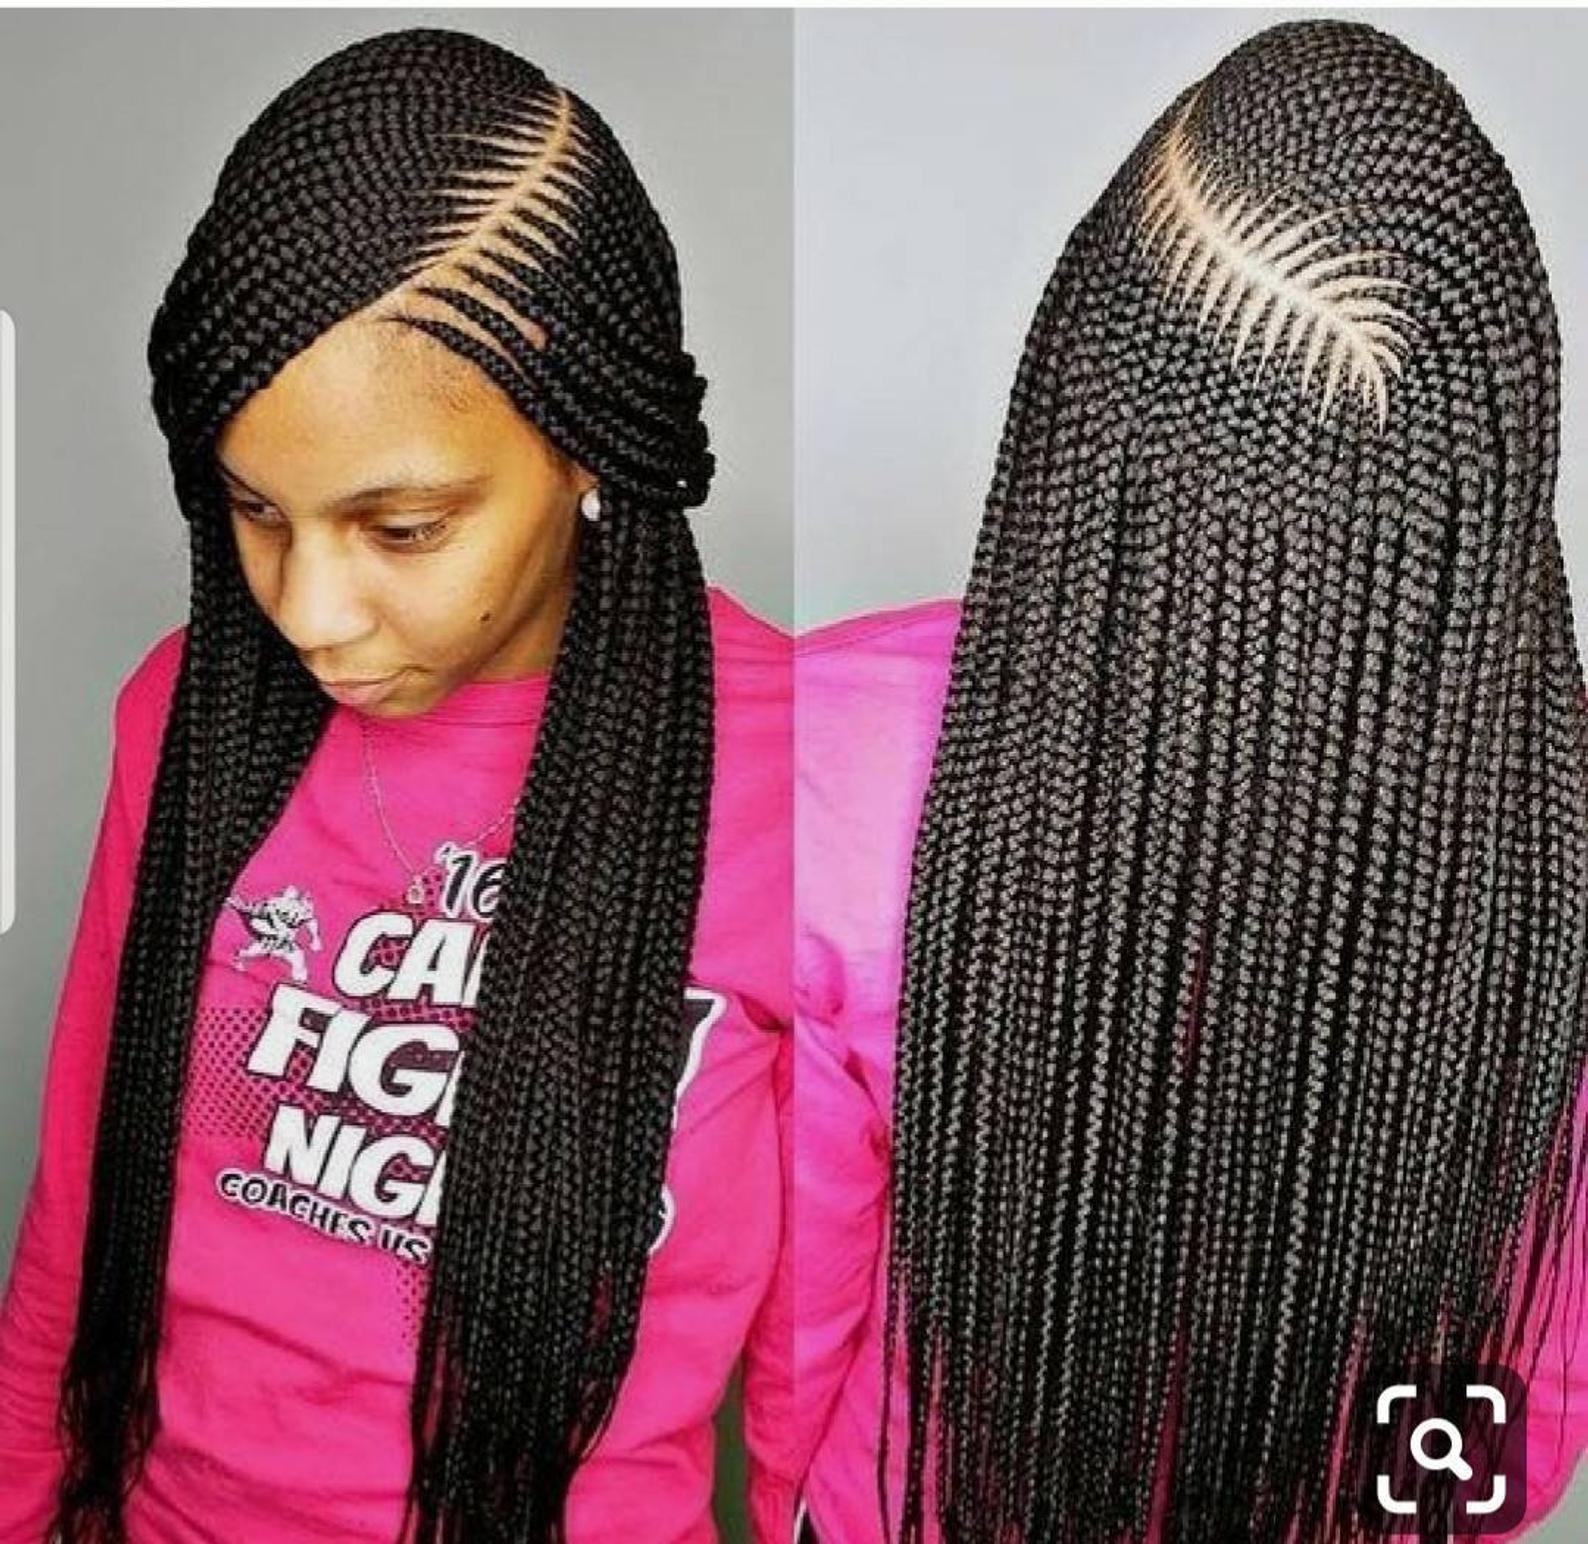 Large Cornrow braided wigcornrow braid lace wig cornrow wigs full lace braided wigGhana weaving braided wigcornrows